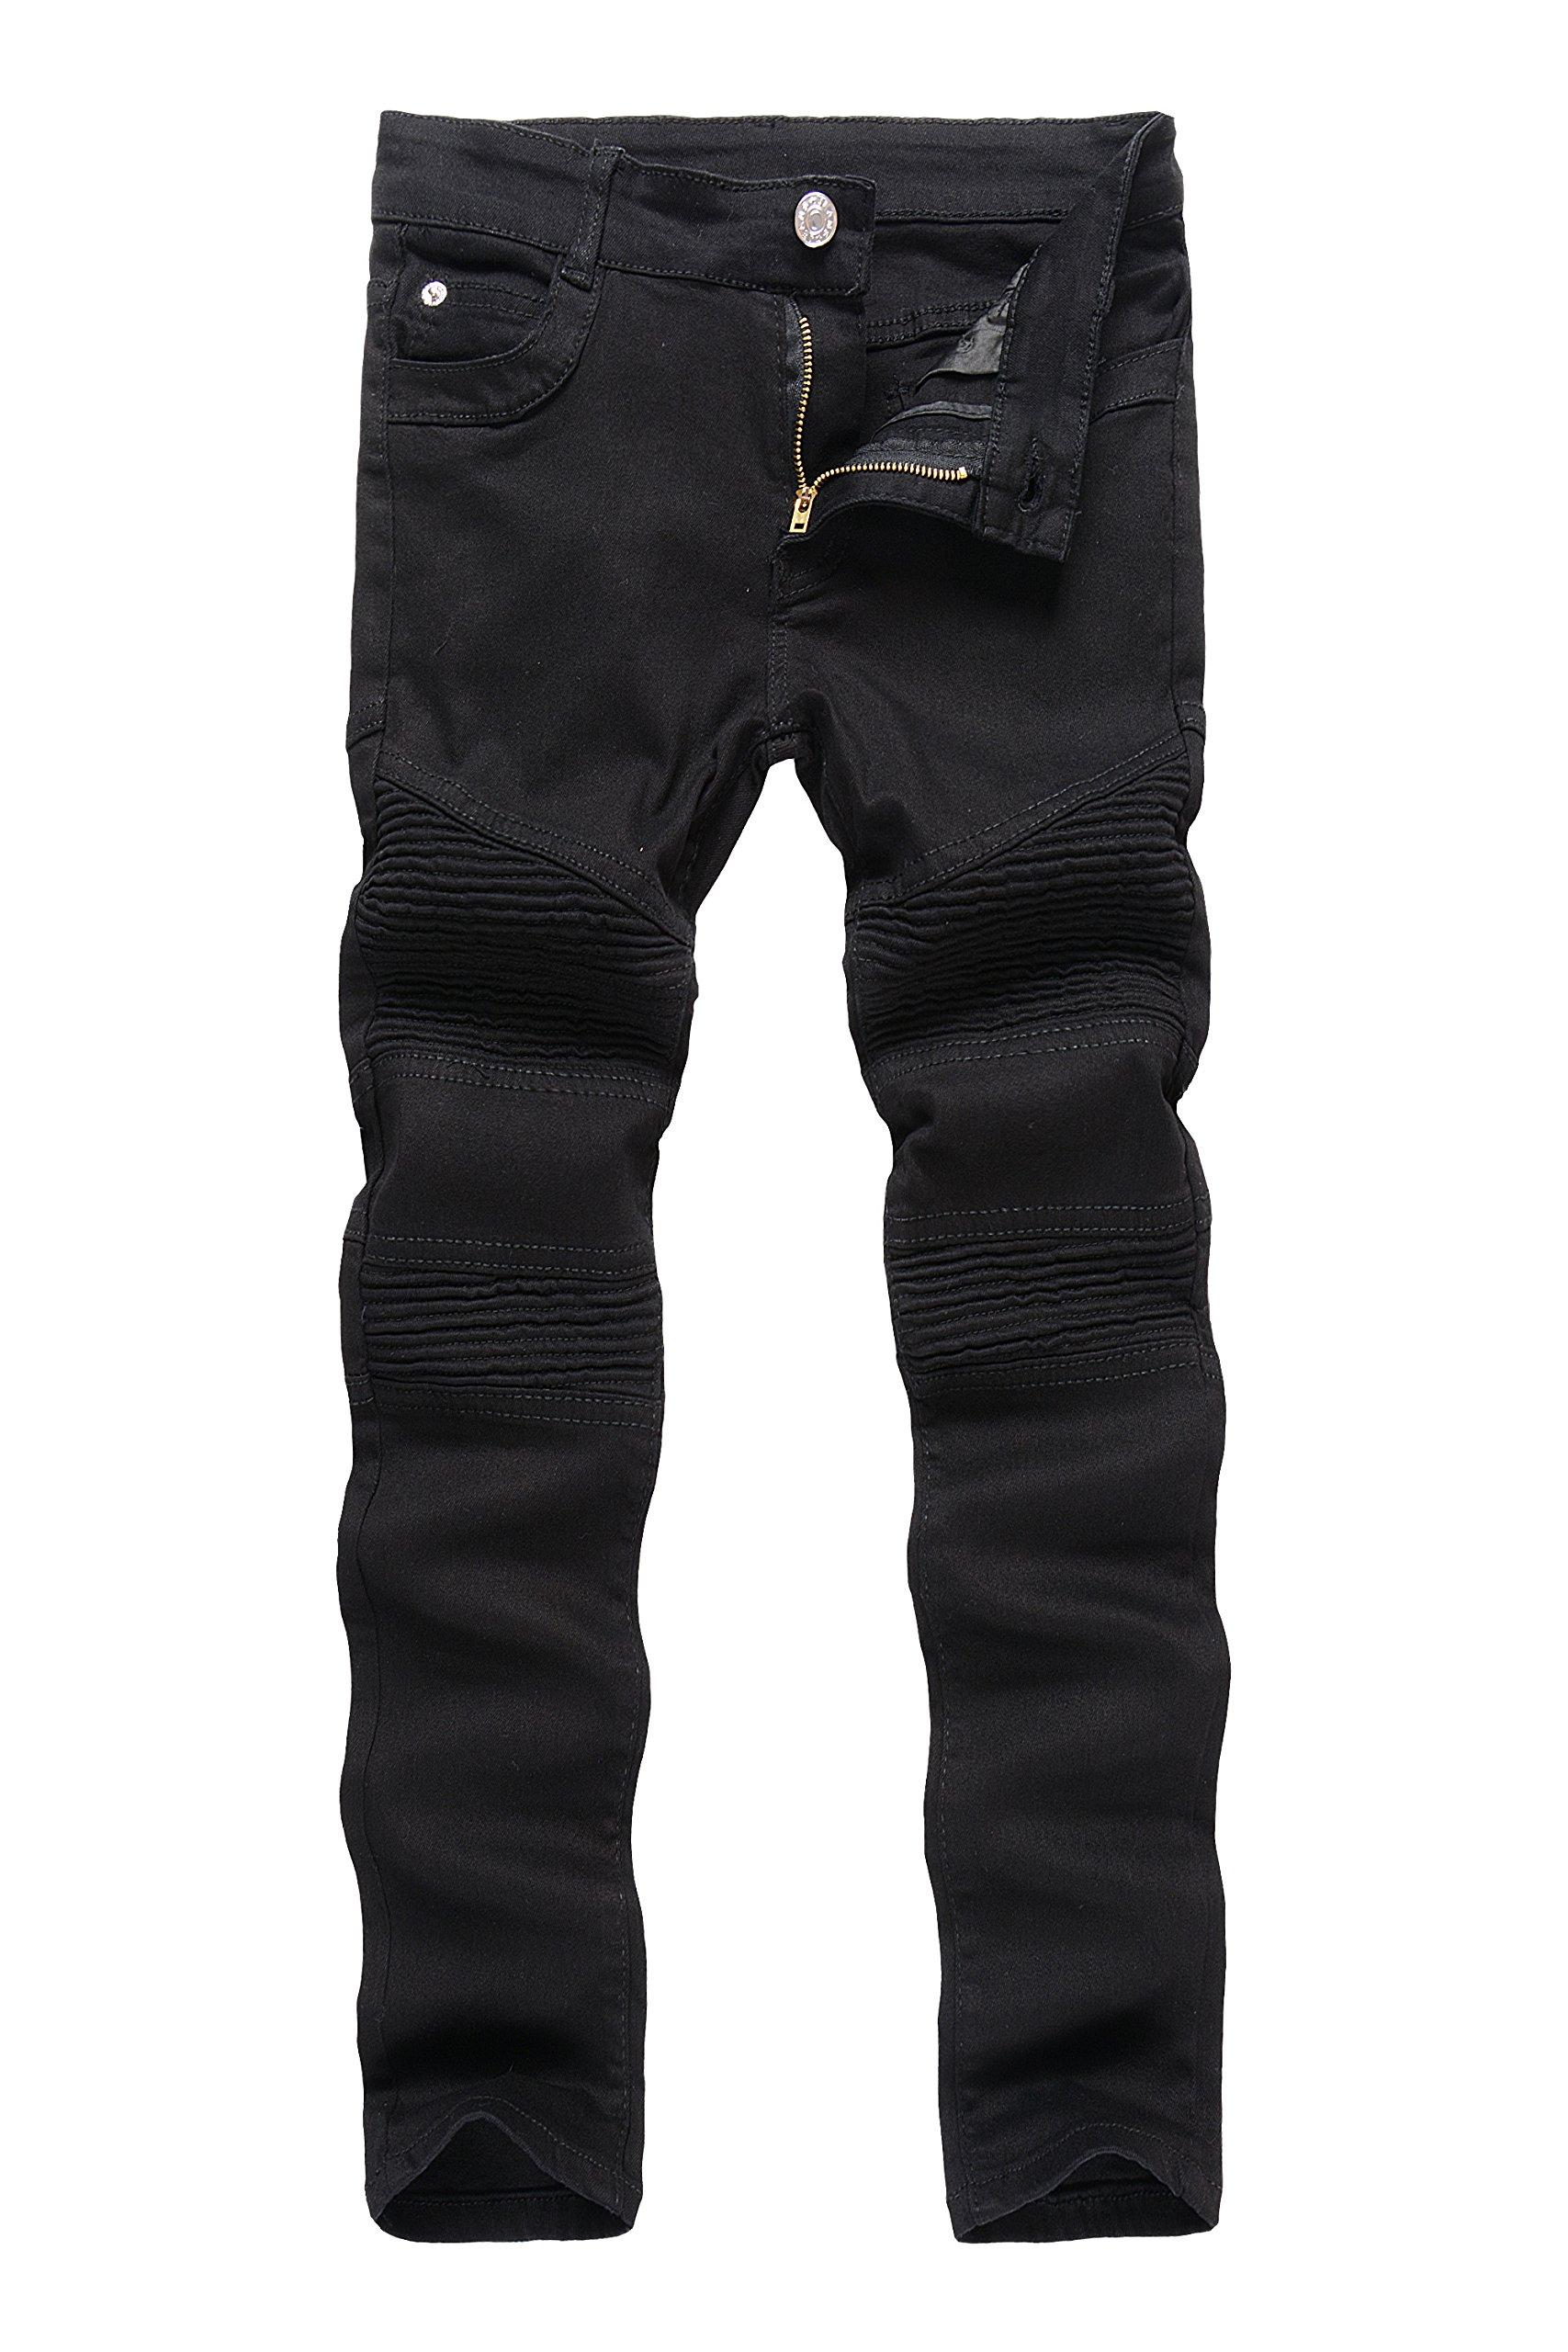 Boy's Black Biker Moto Ripped Distressed Fashion Skinny Slim Fit Jeans 8